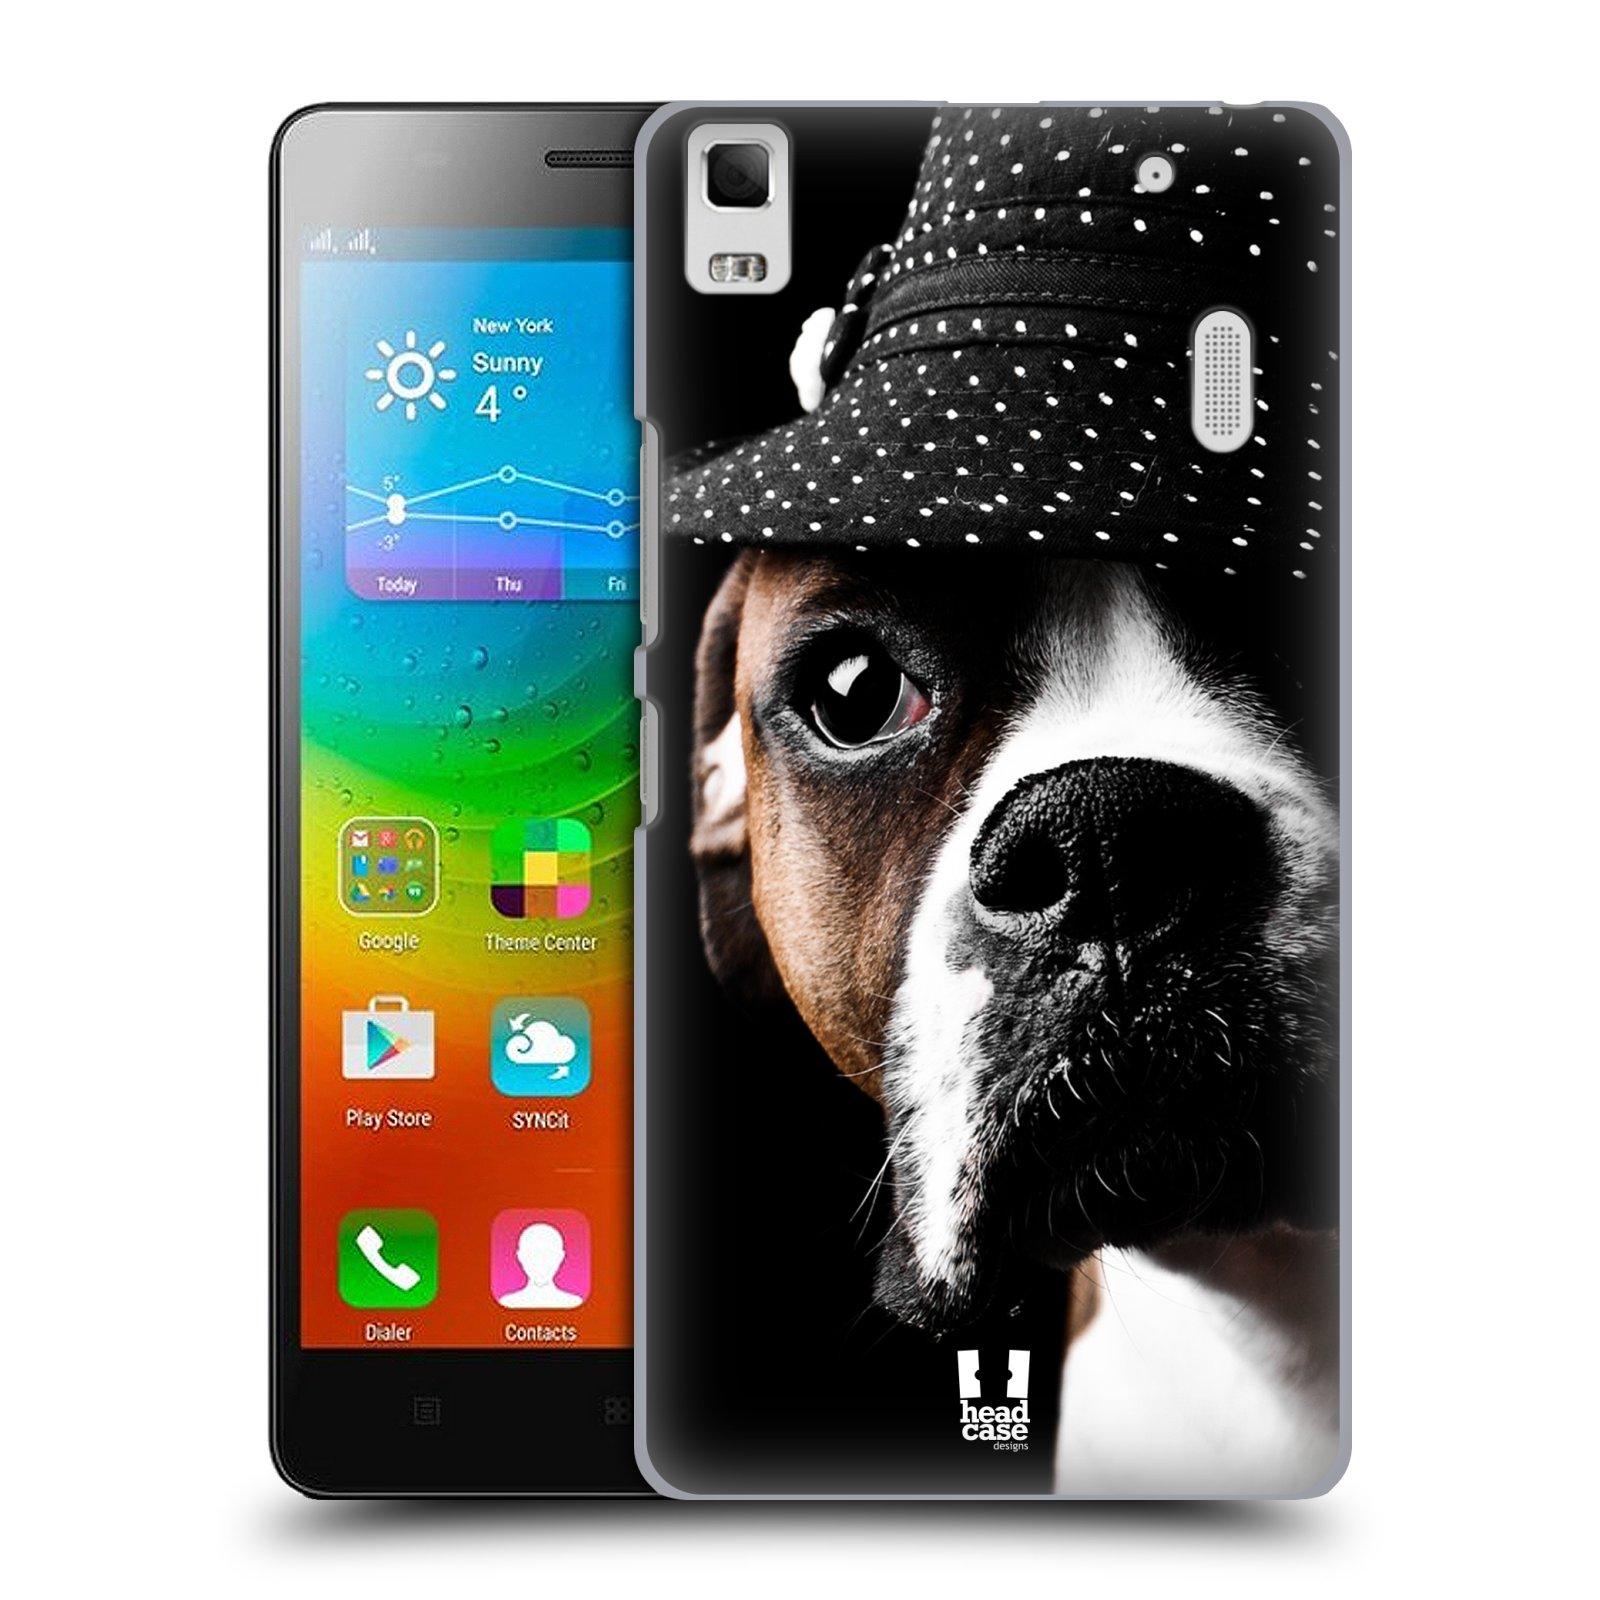 HEAD CASE pevný plastový obal na mobil LENOVO A7000 / A7000 DUAL / K3 NOTE vzor Legrační zvířátka pejsek frajer